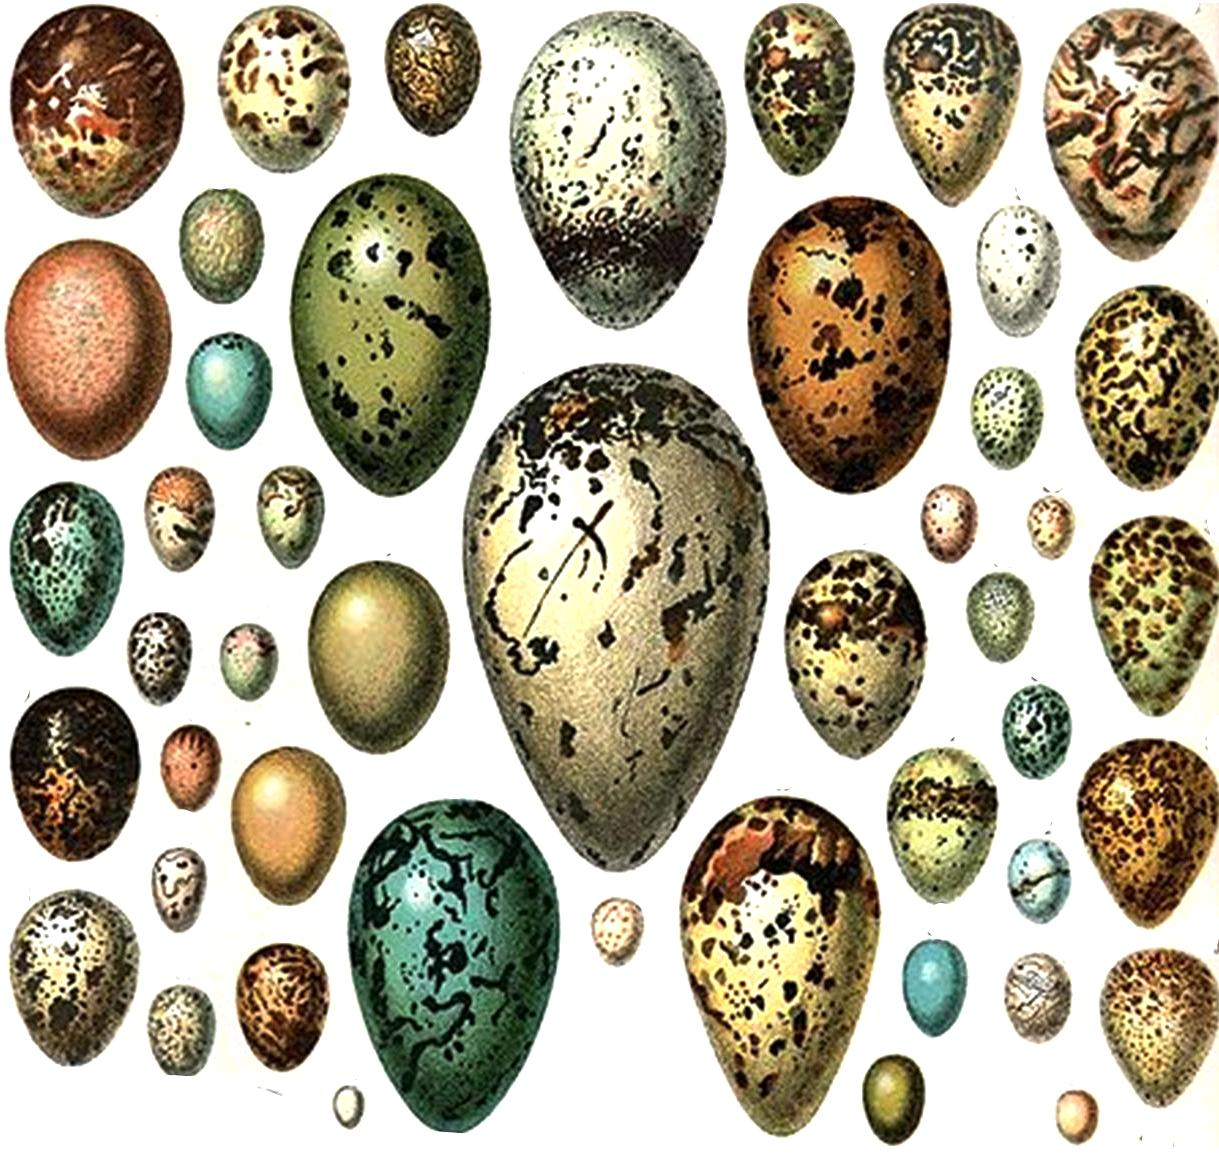 wild birds unlimited why are bluebird eggs blue